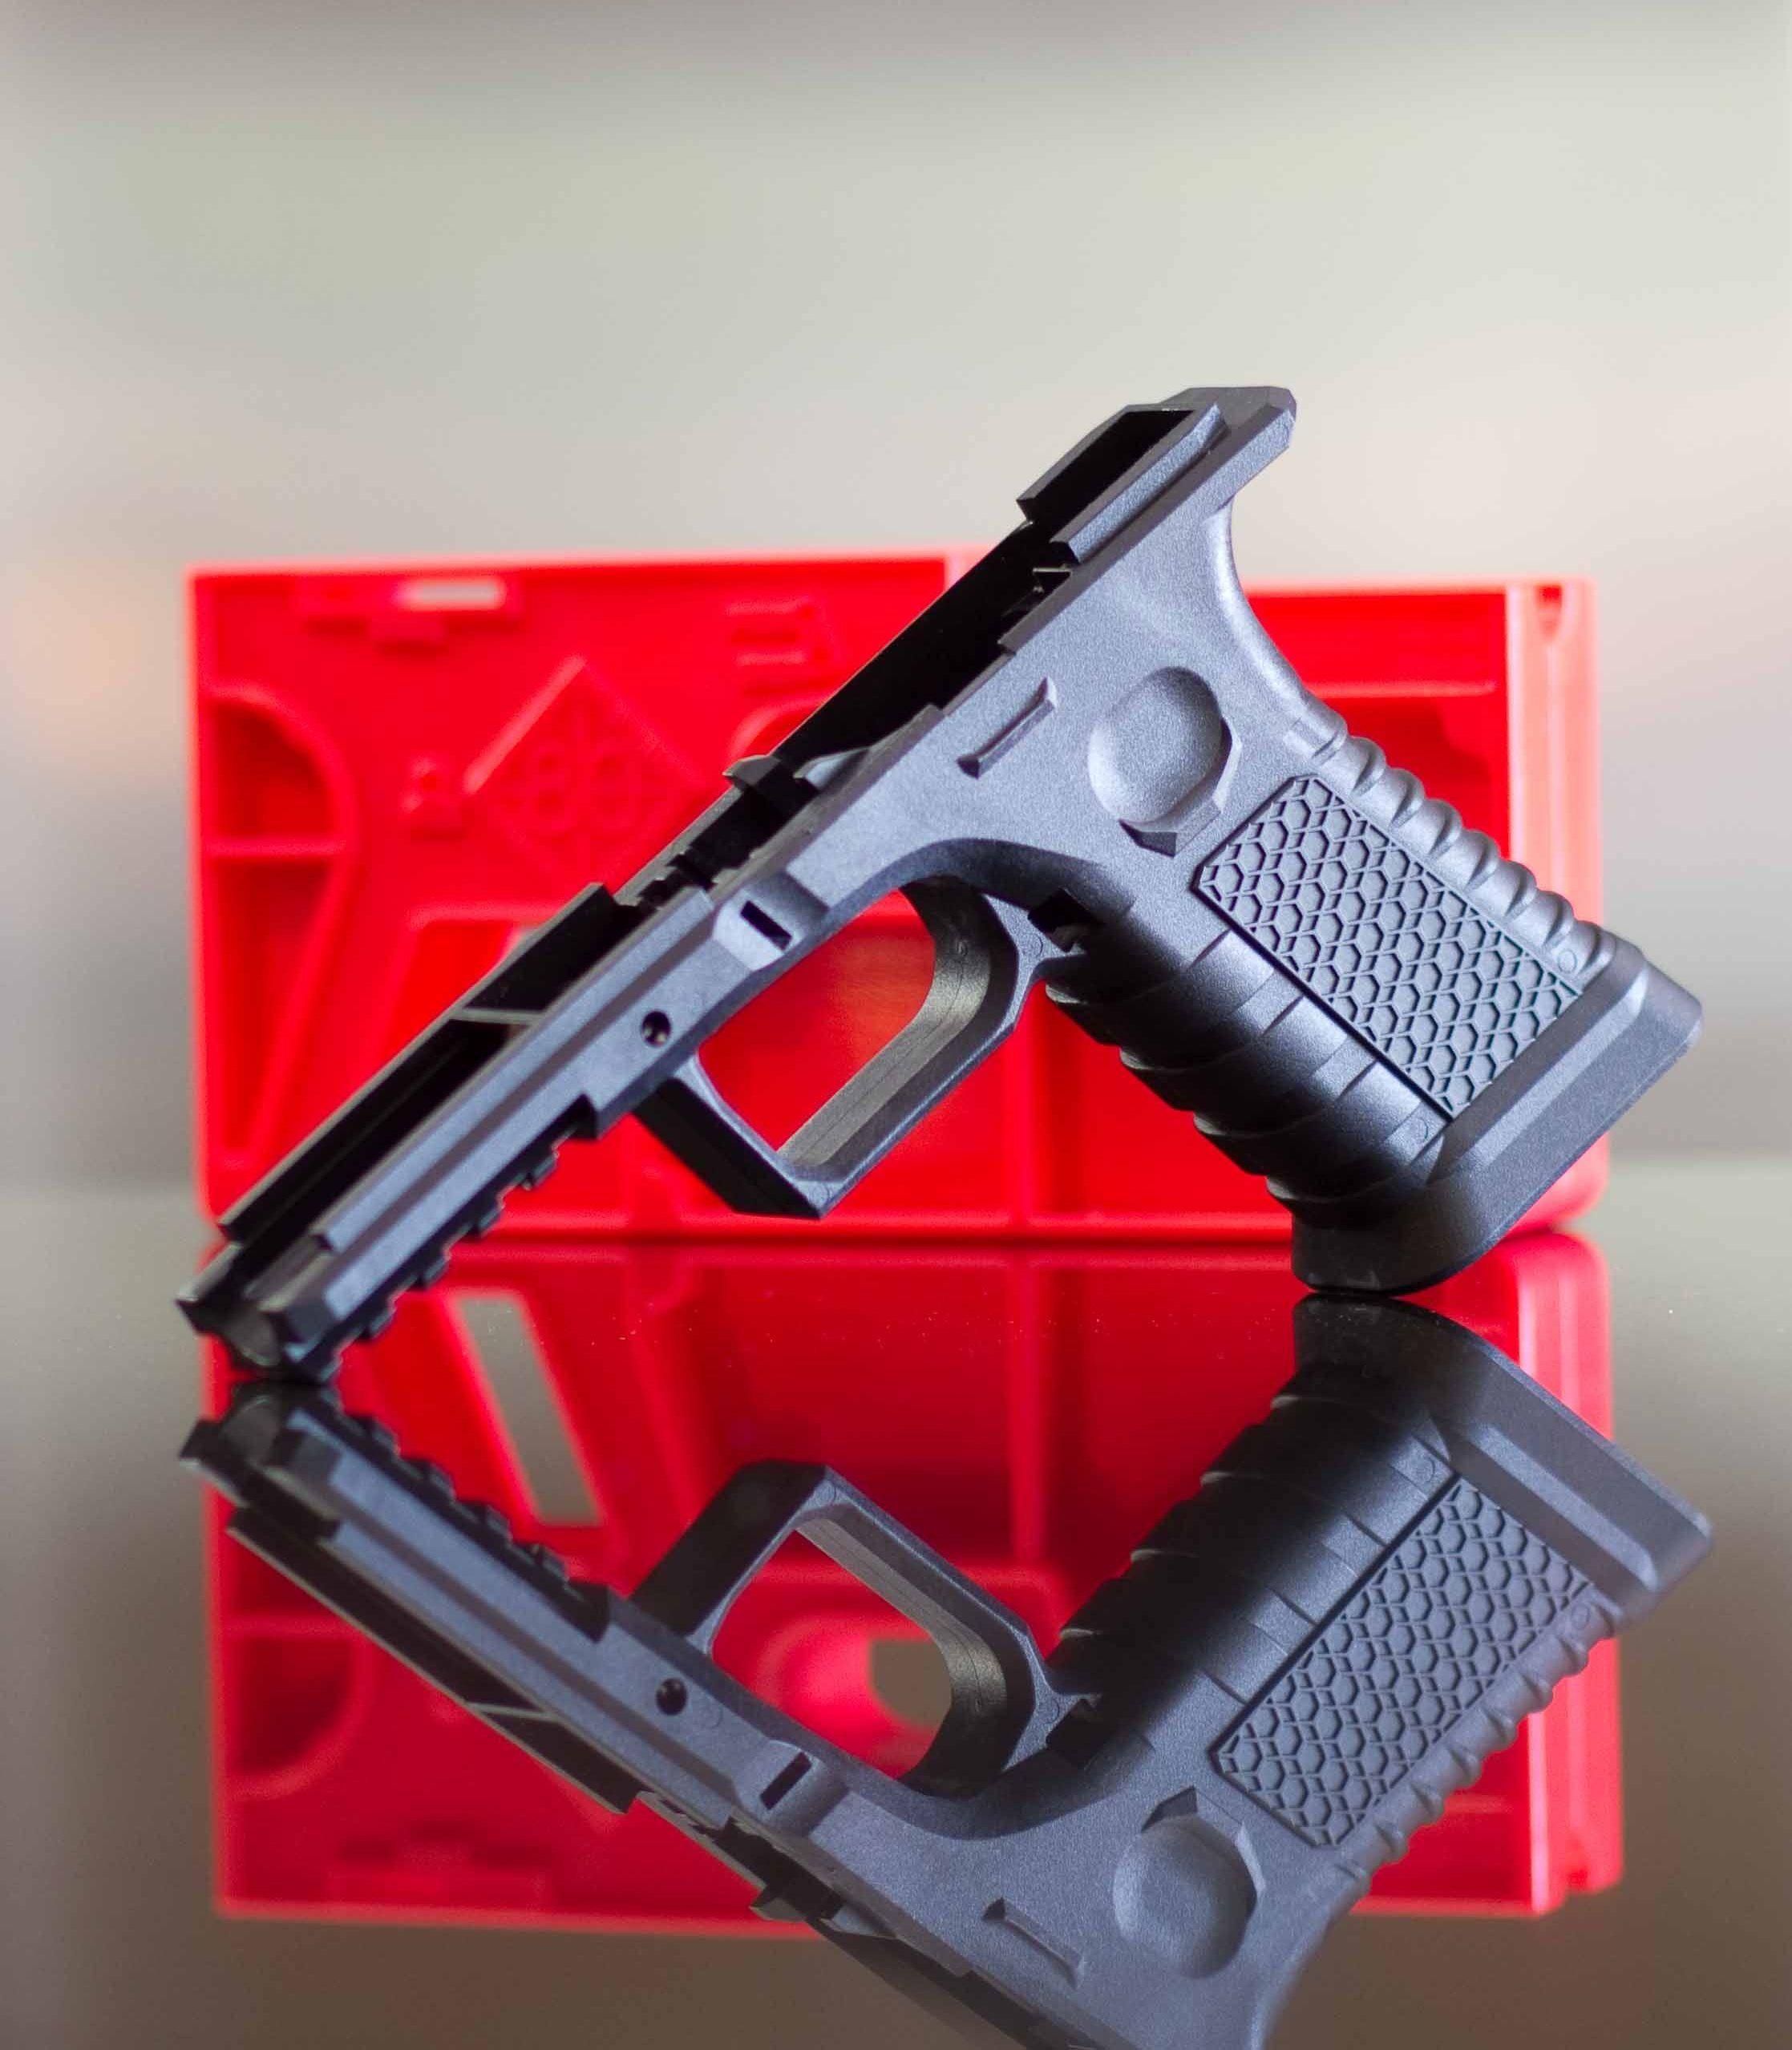 Glock 80% Spectre Parts List